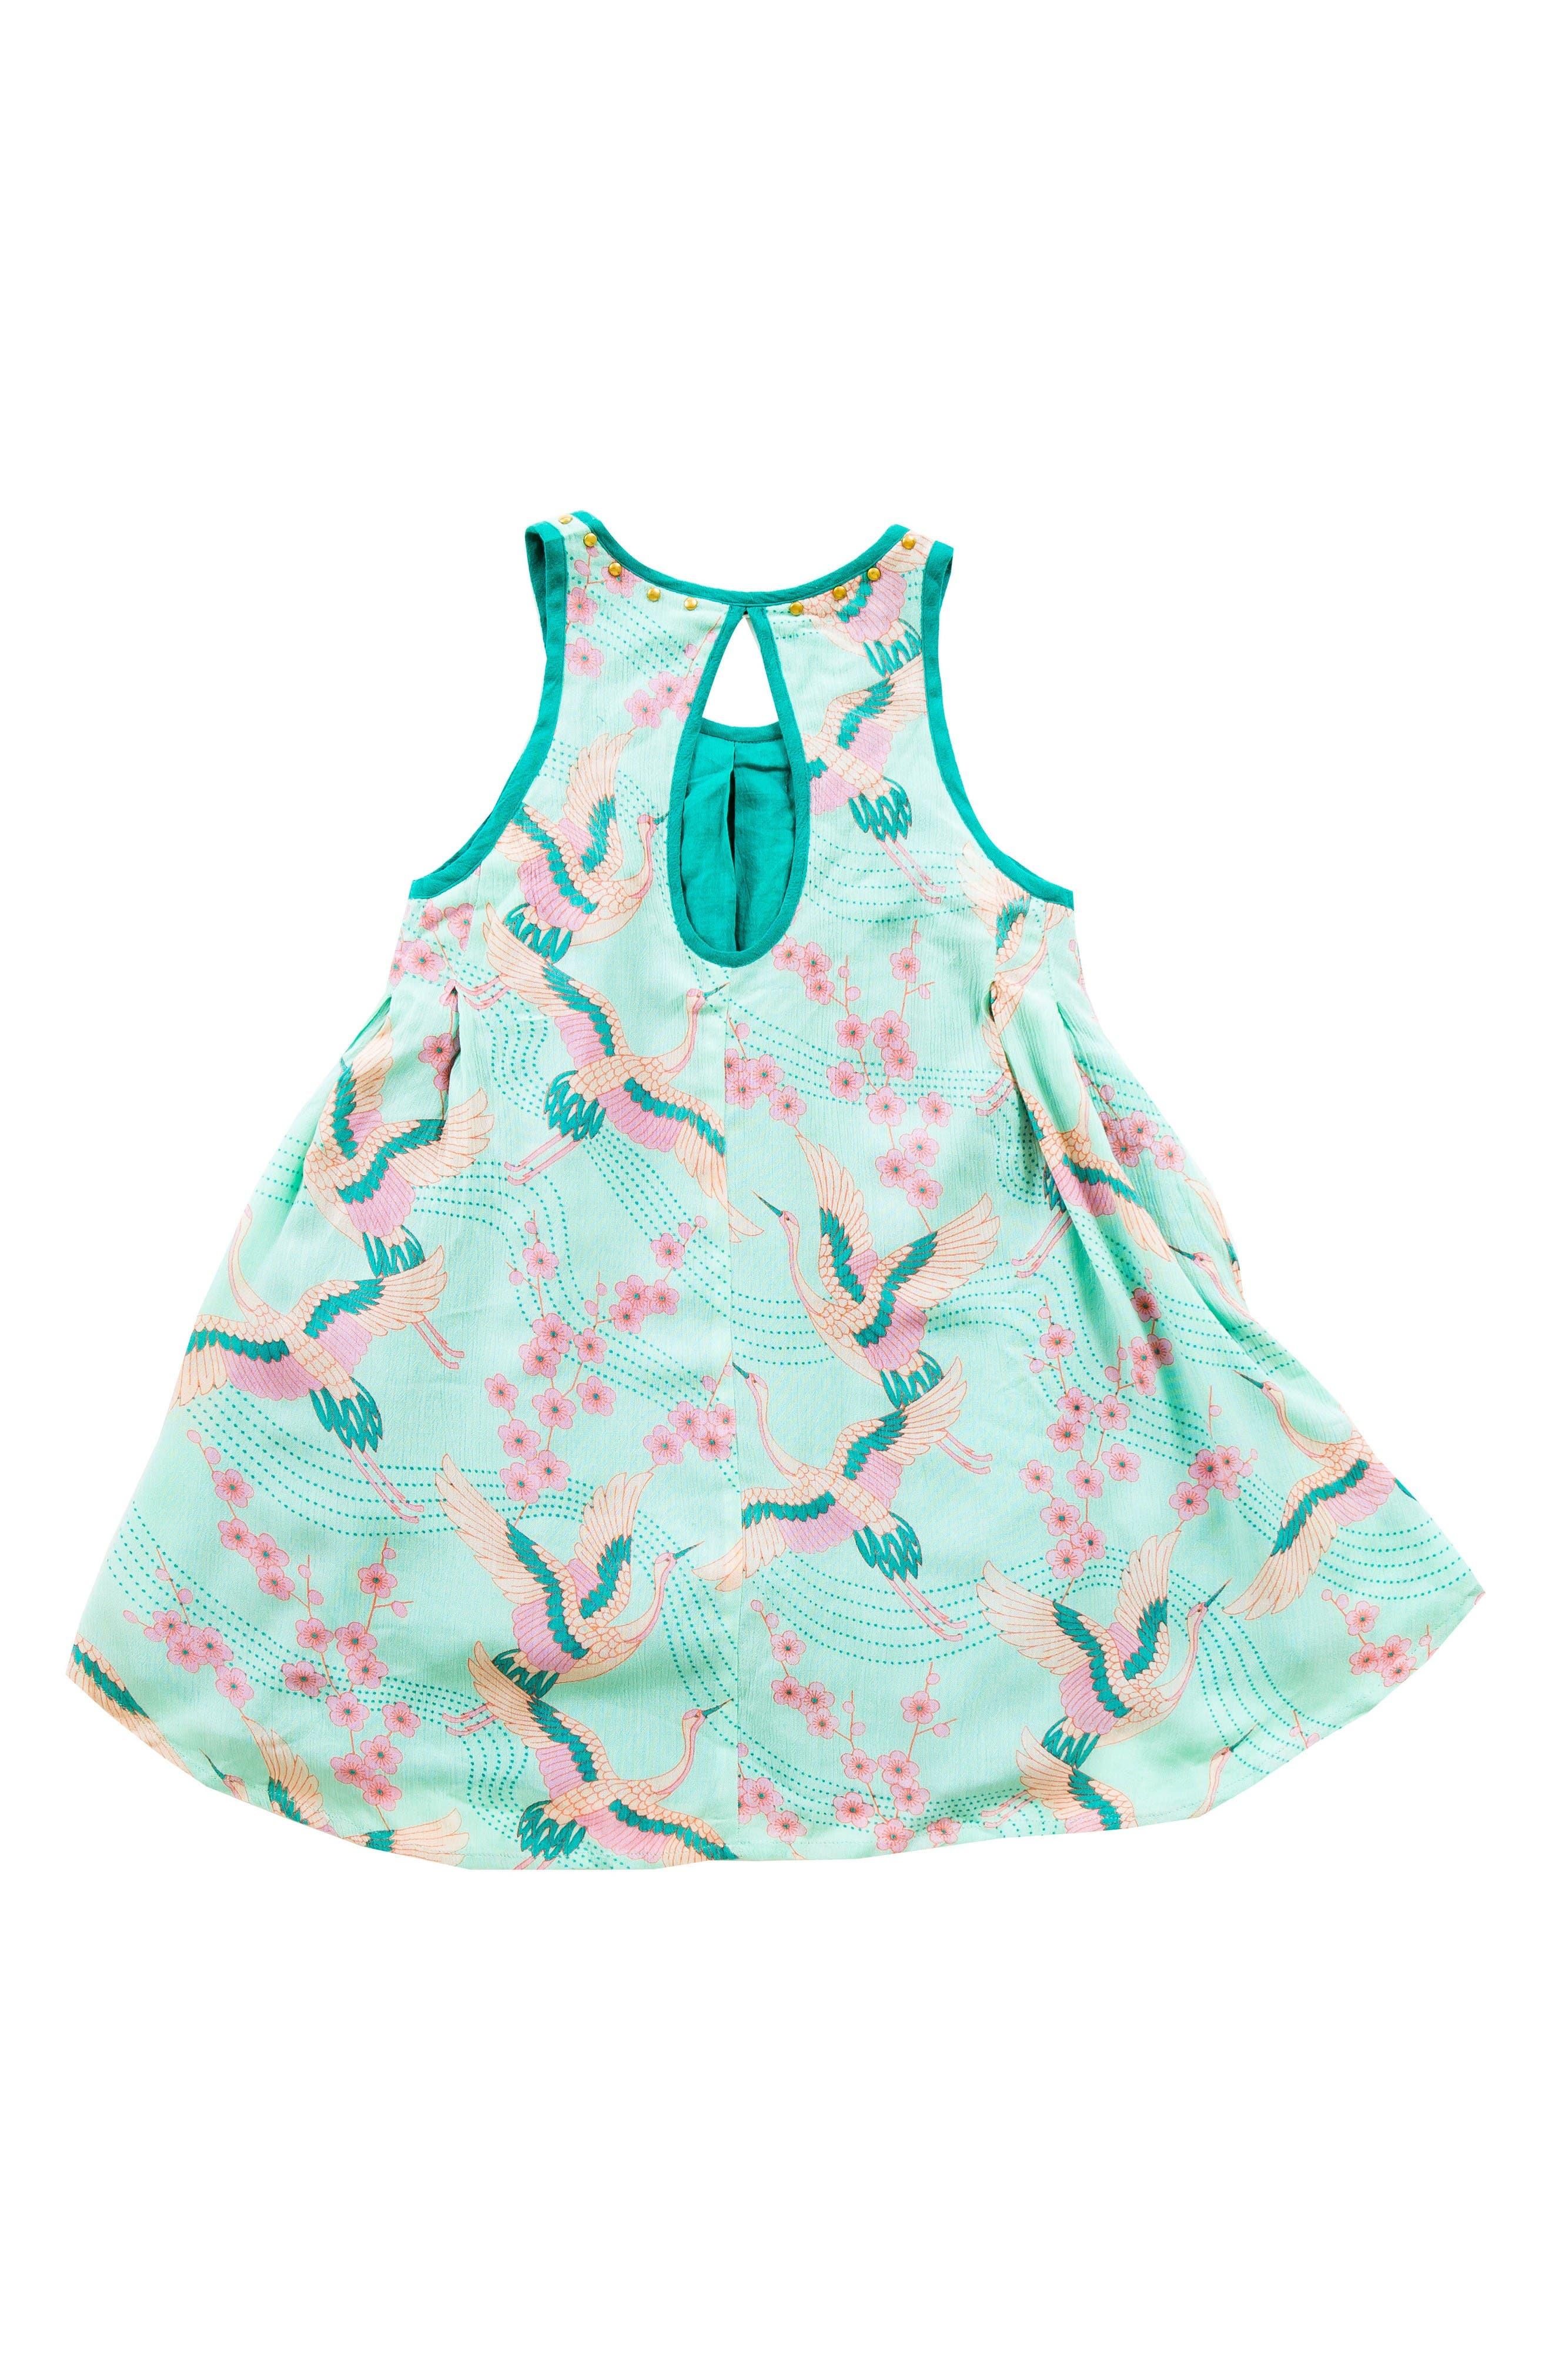 Alternate Image 3  - BOWIE X JAMES Print Trapeze Dress (Toddler Girls, Little Girls & Big Girls)